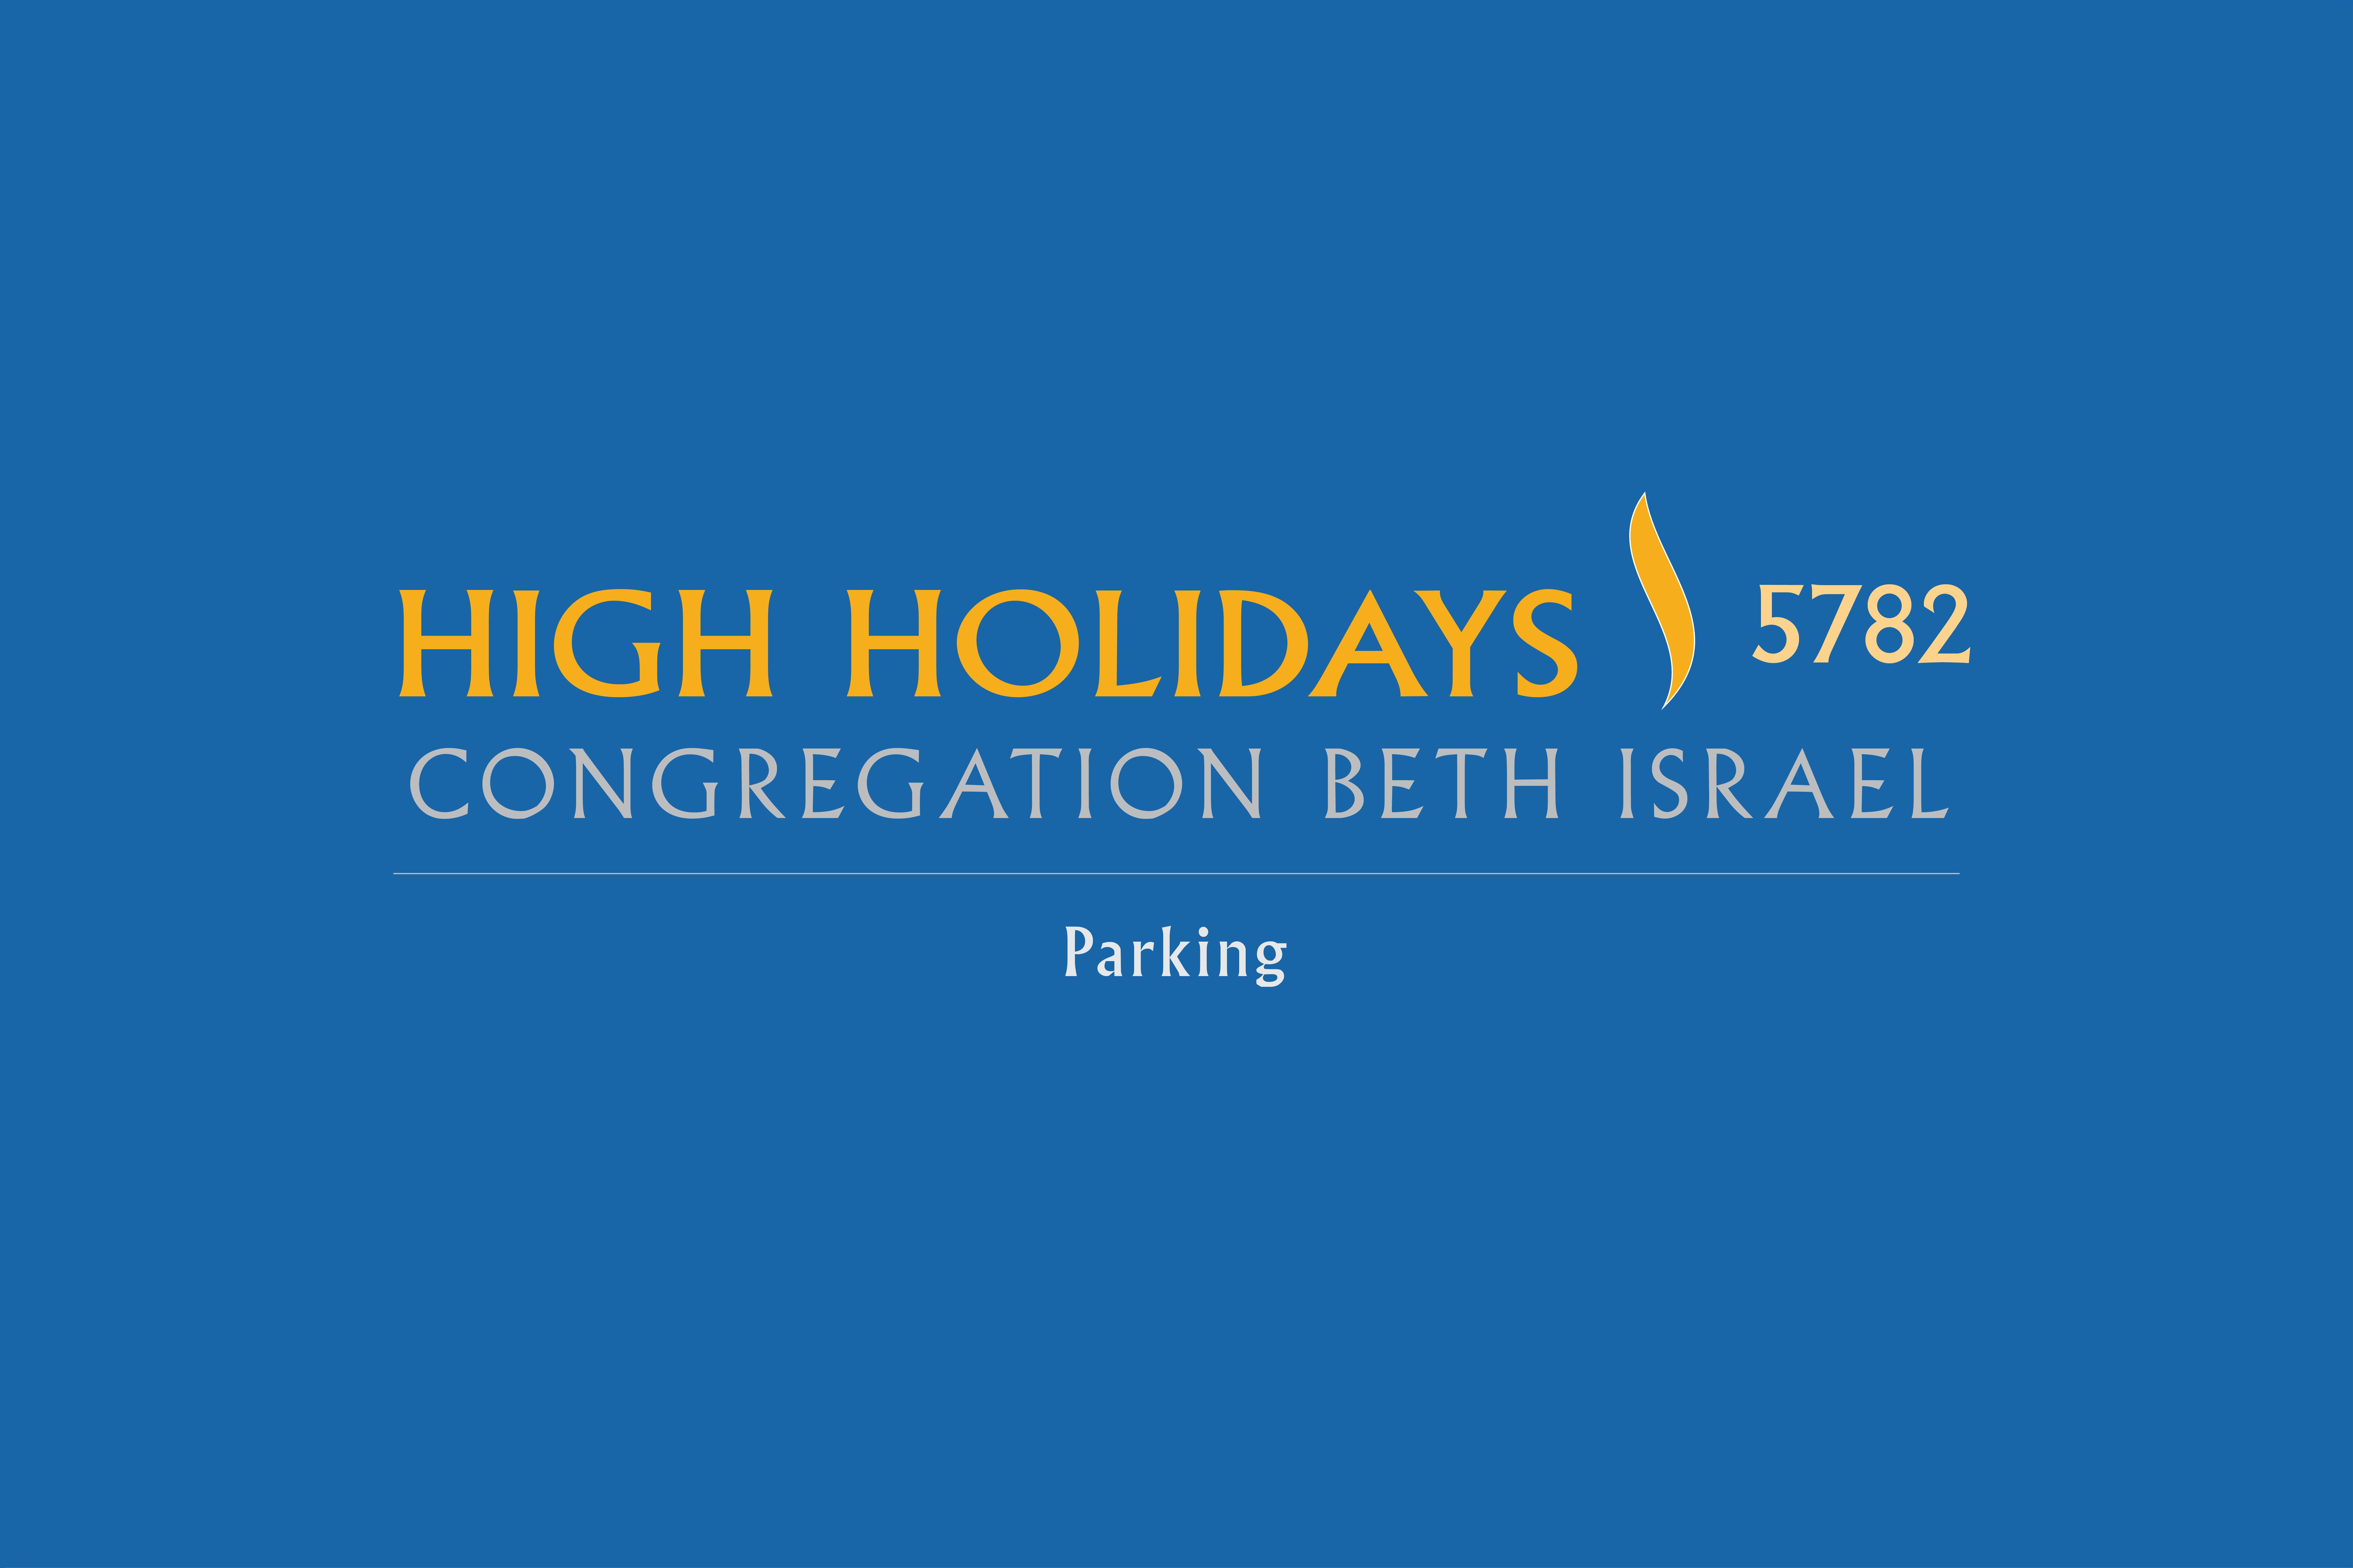 High Holidays Parking